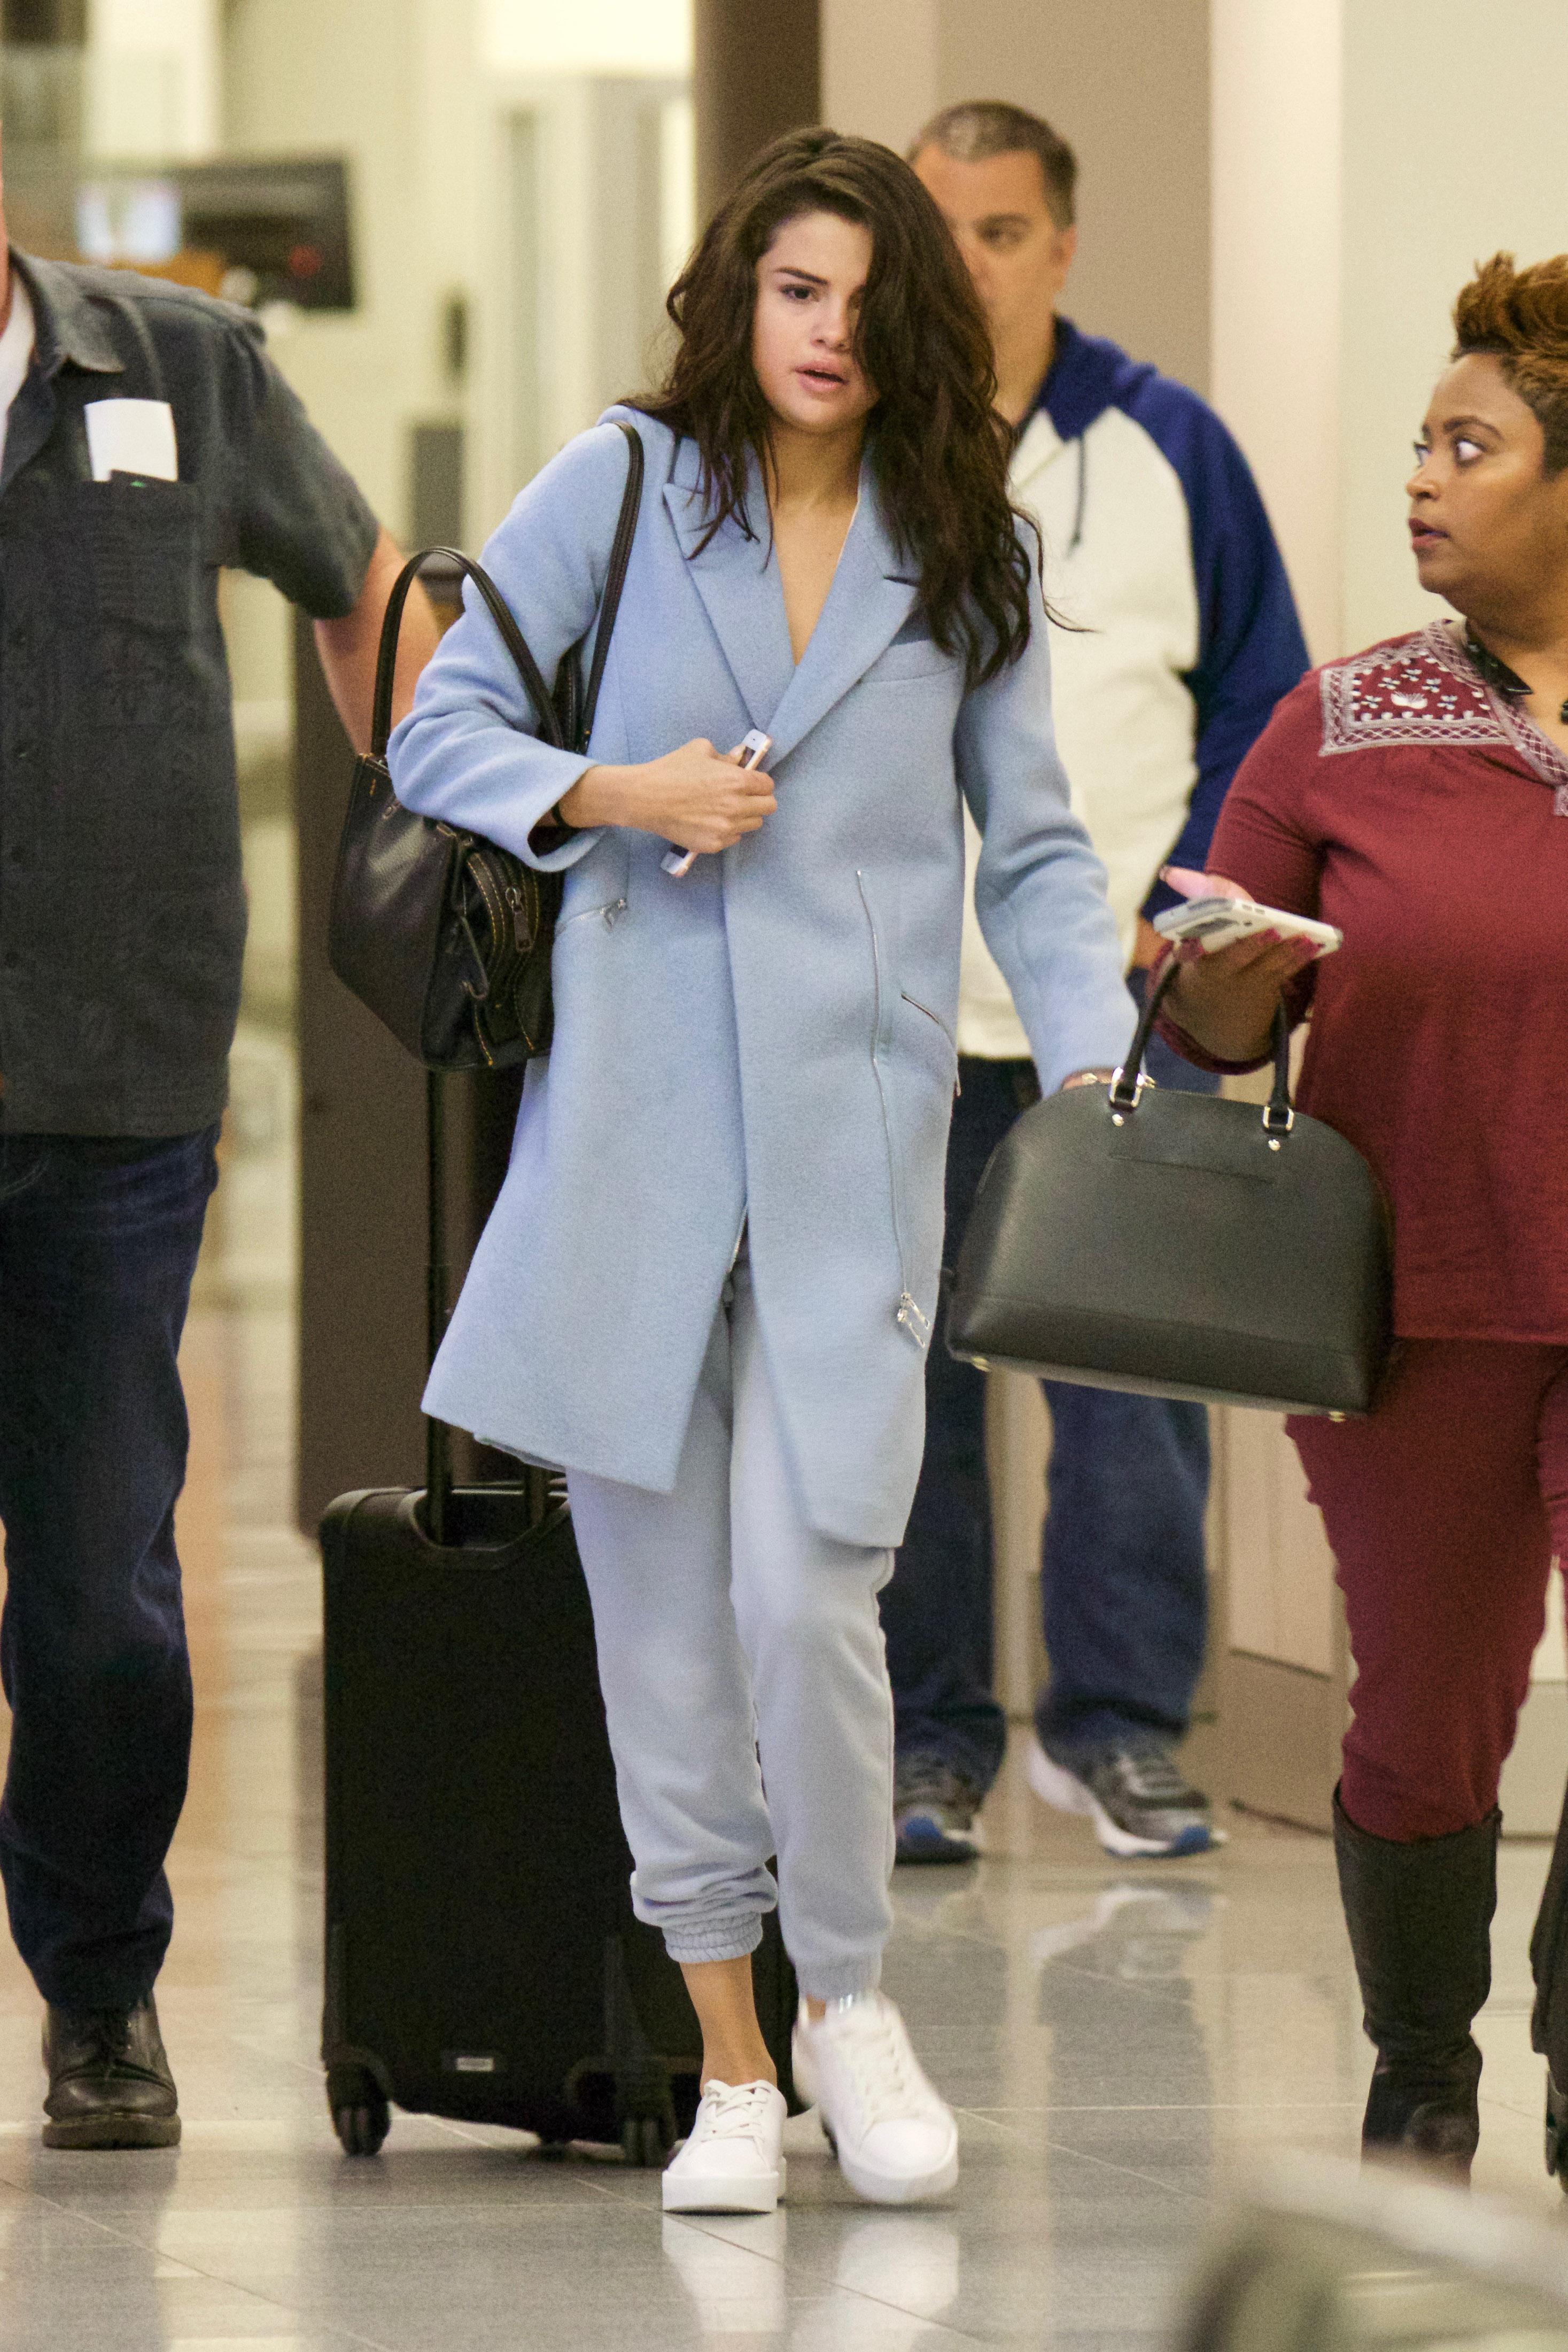 EXCLUSIVE Makeup Free Selena Gomez Looks Sleepy As She Touch Down In Atlanta